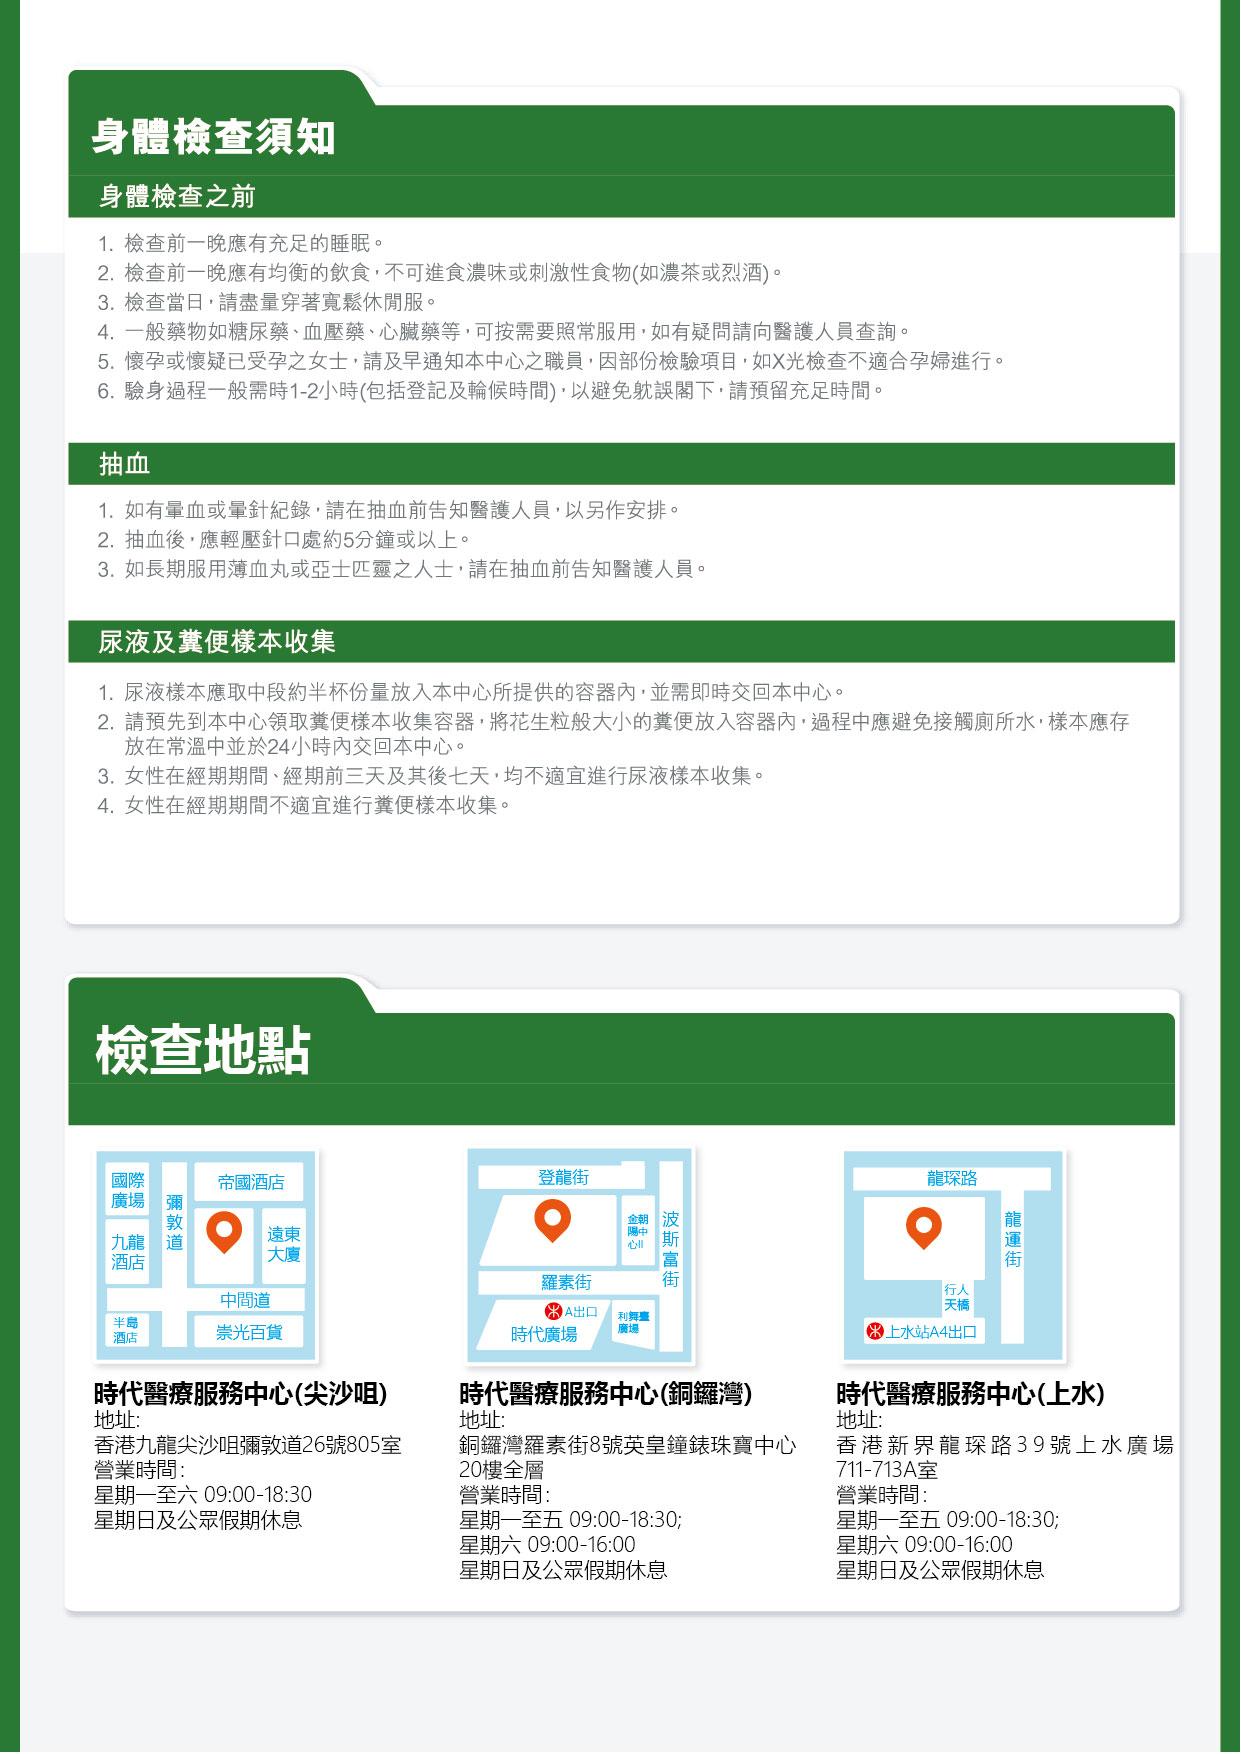 bcdhhmt-domestic-helper-health-check-3.jpg